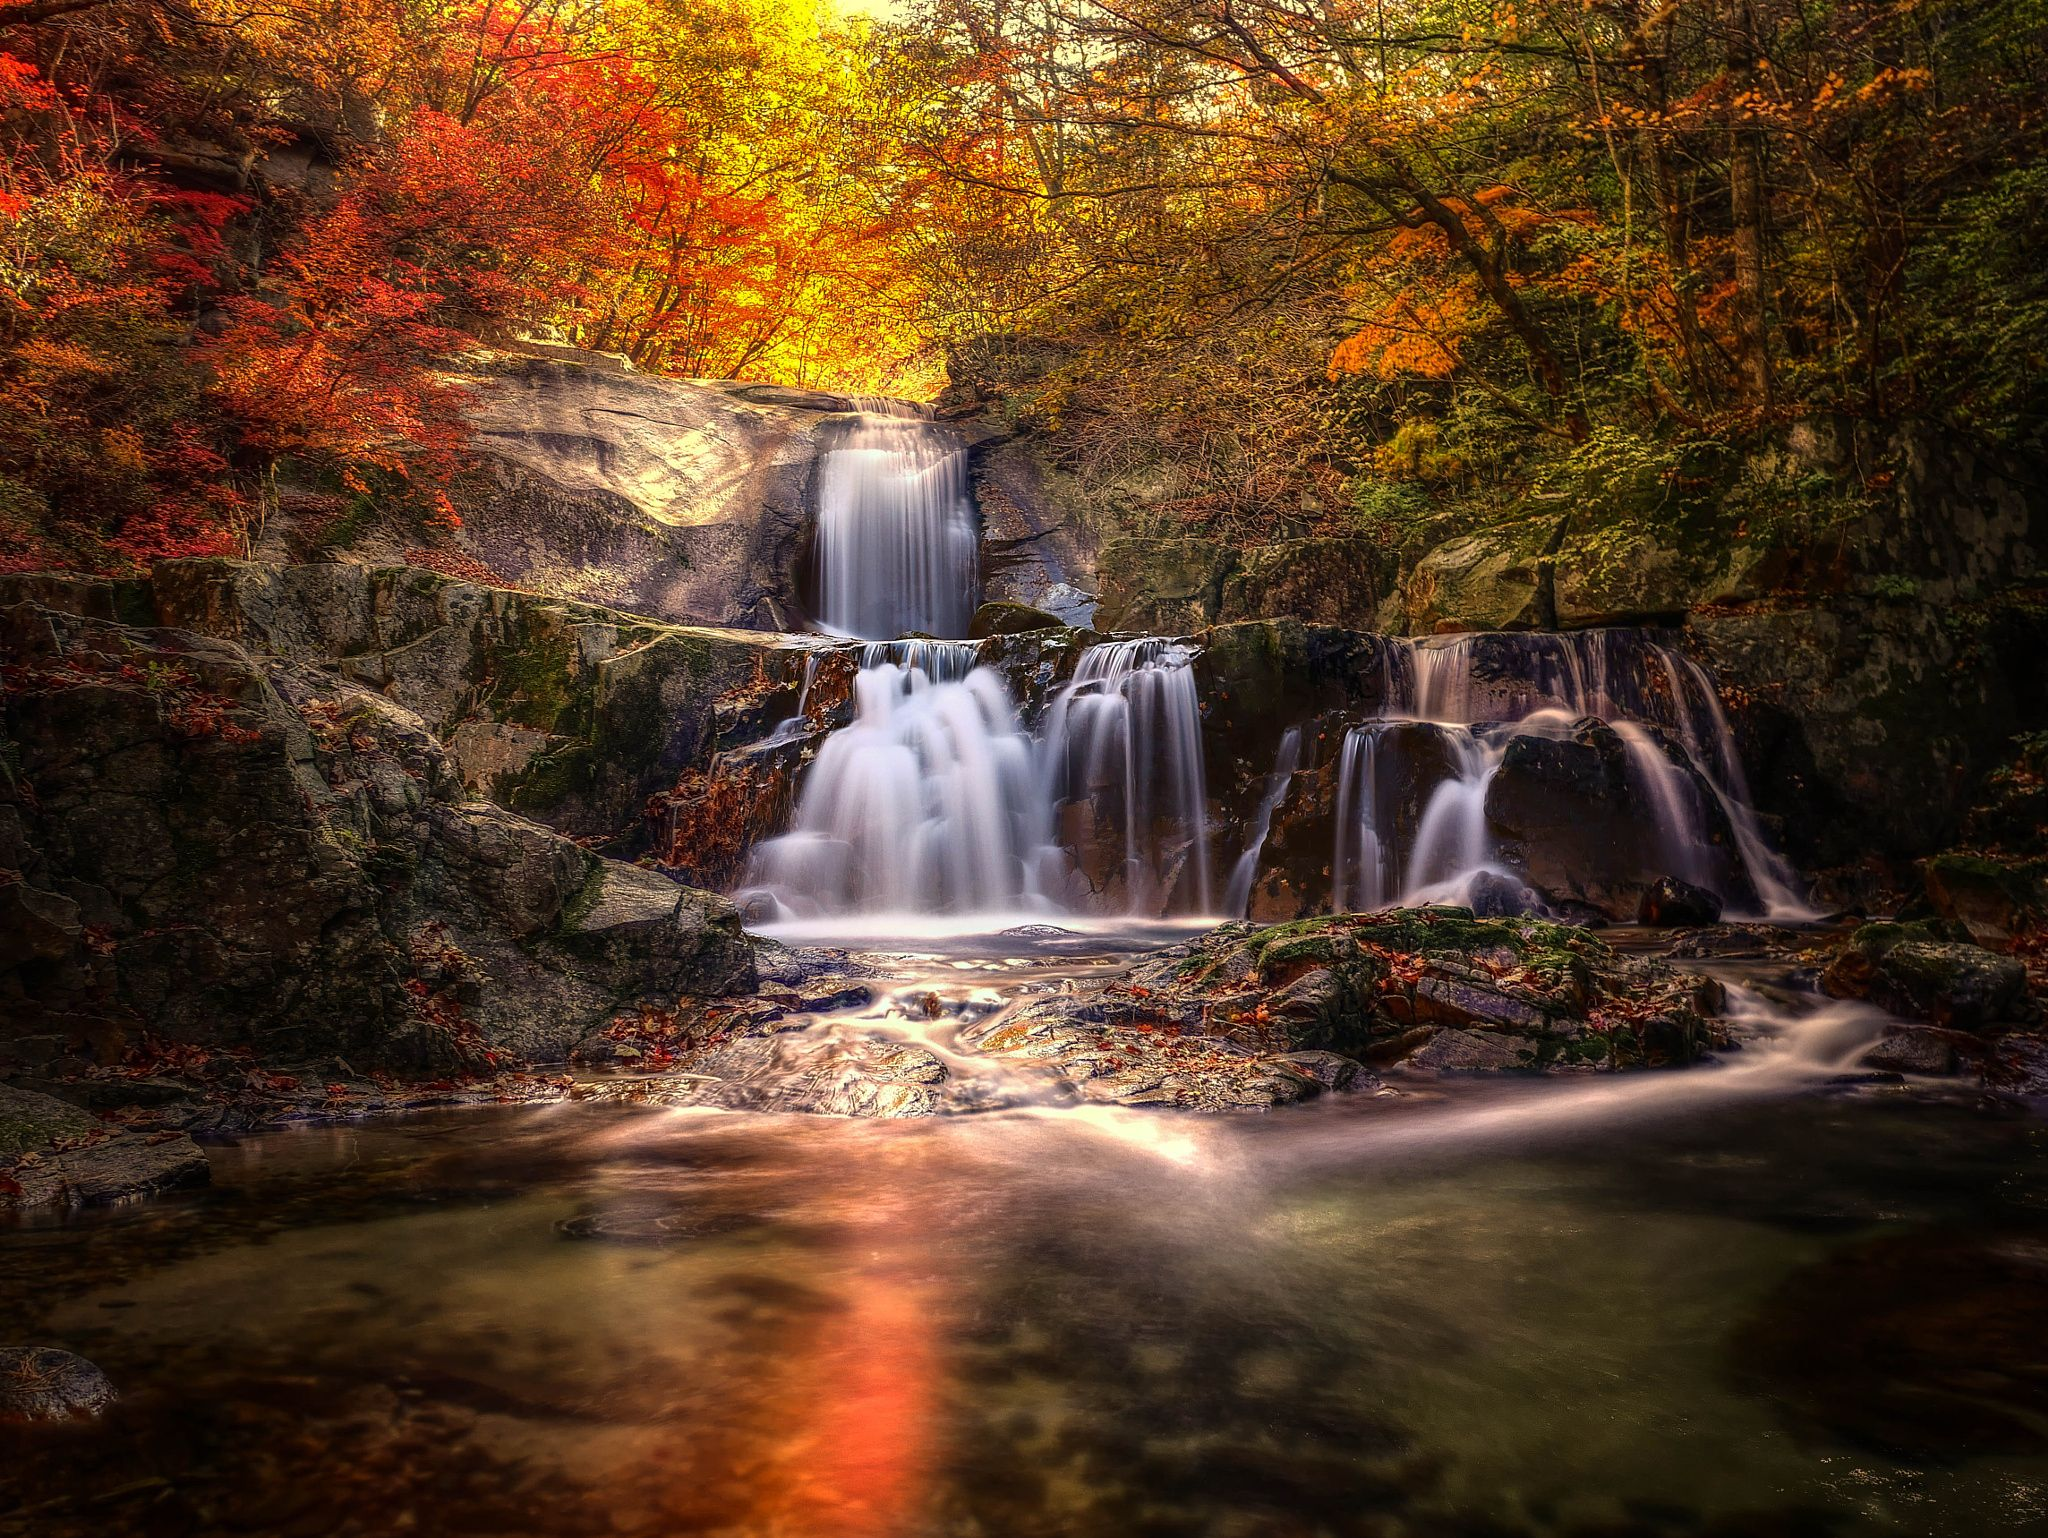 When autumn comes to Korea by Jun Shik Shin - Photo 125962645 - 500px